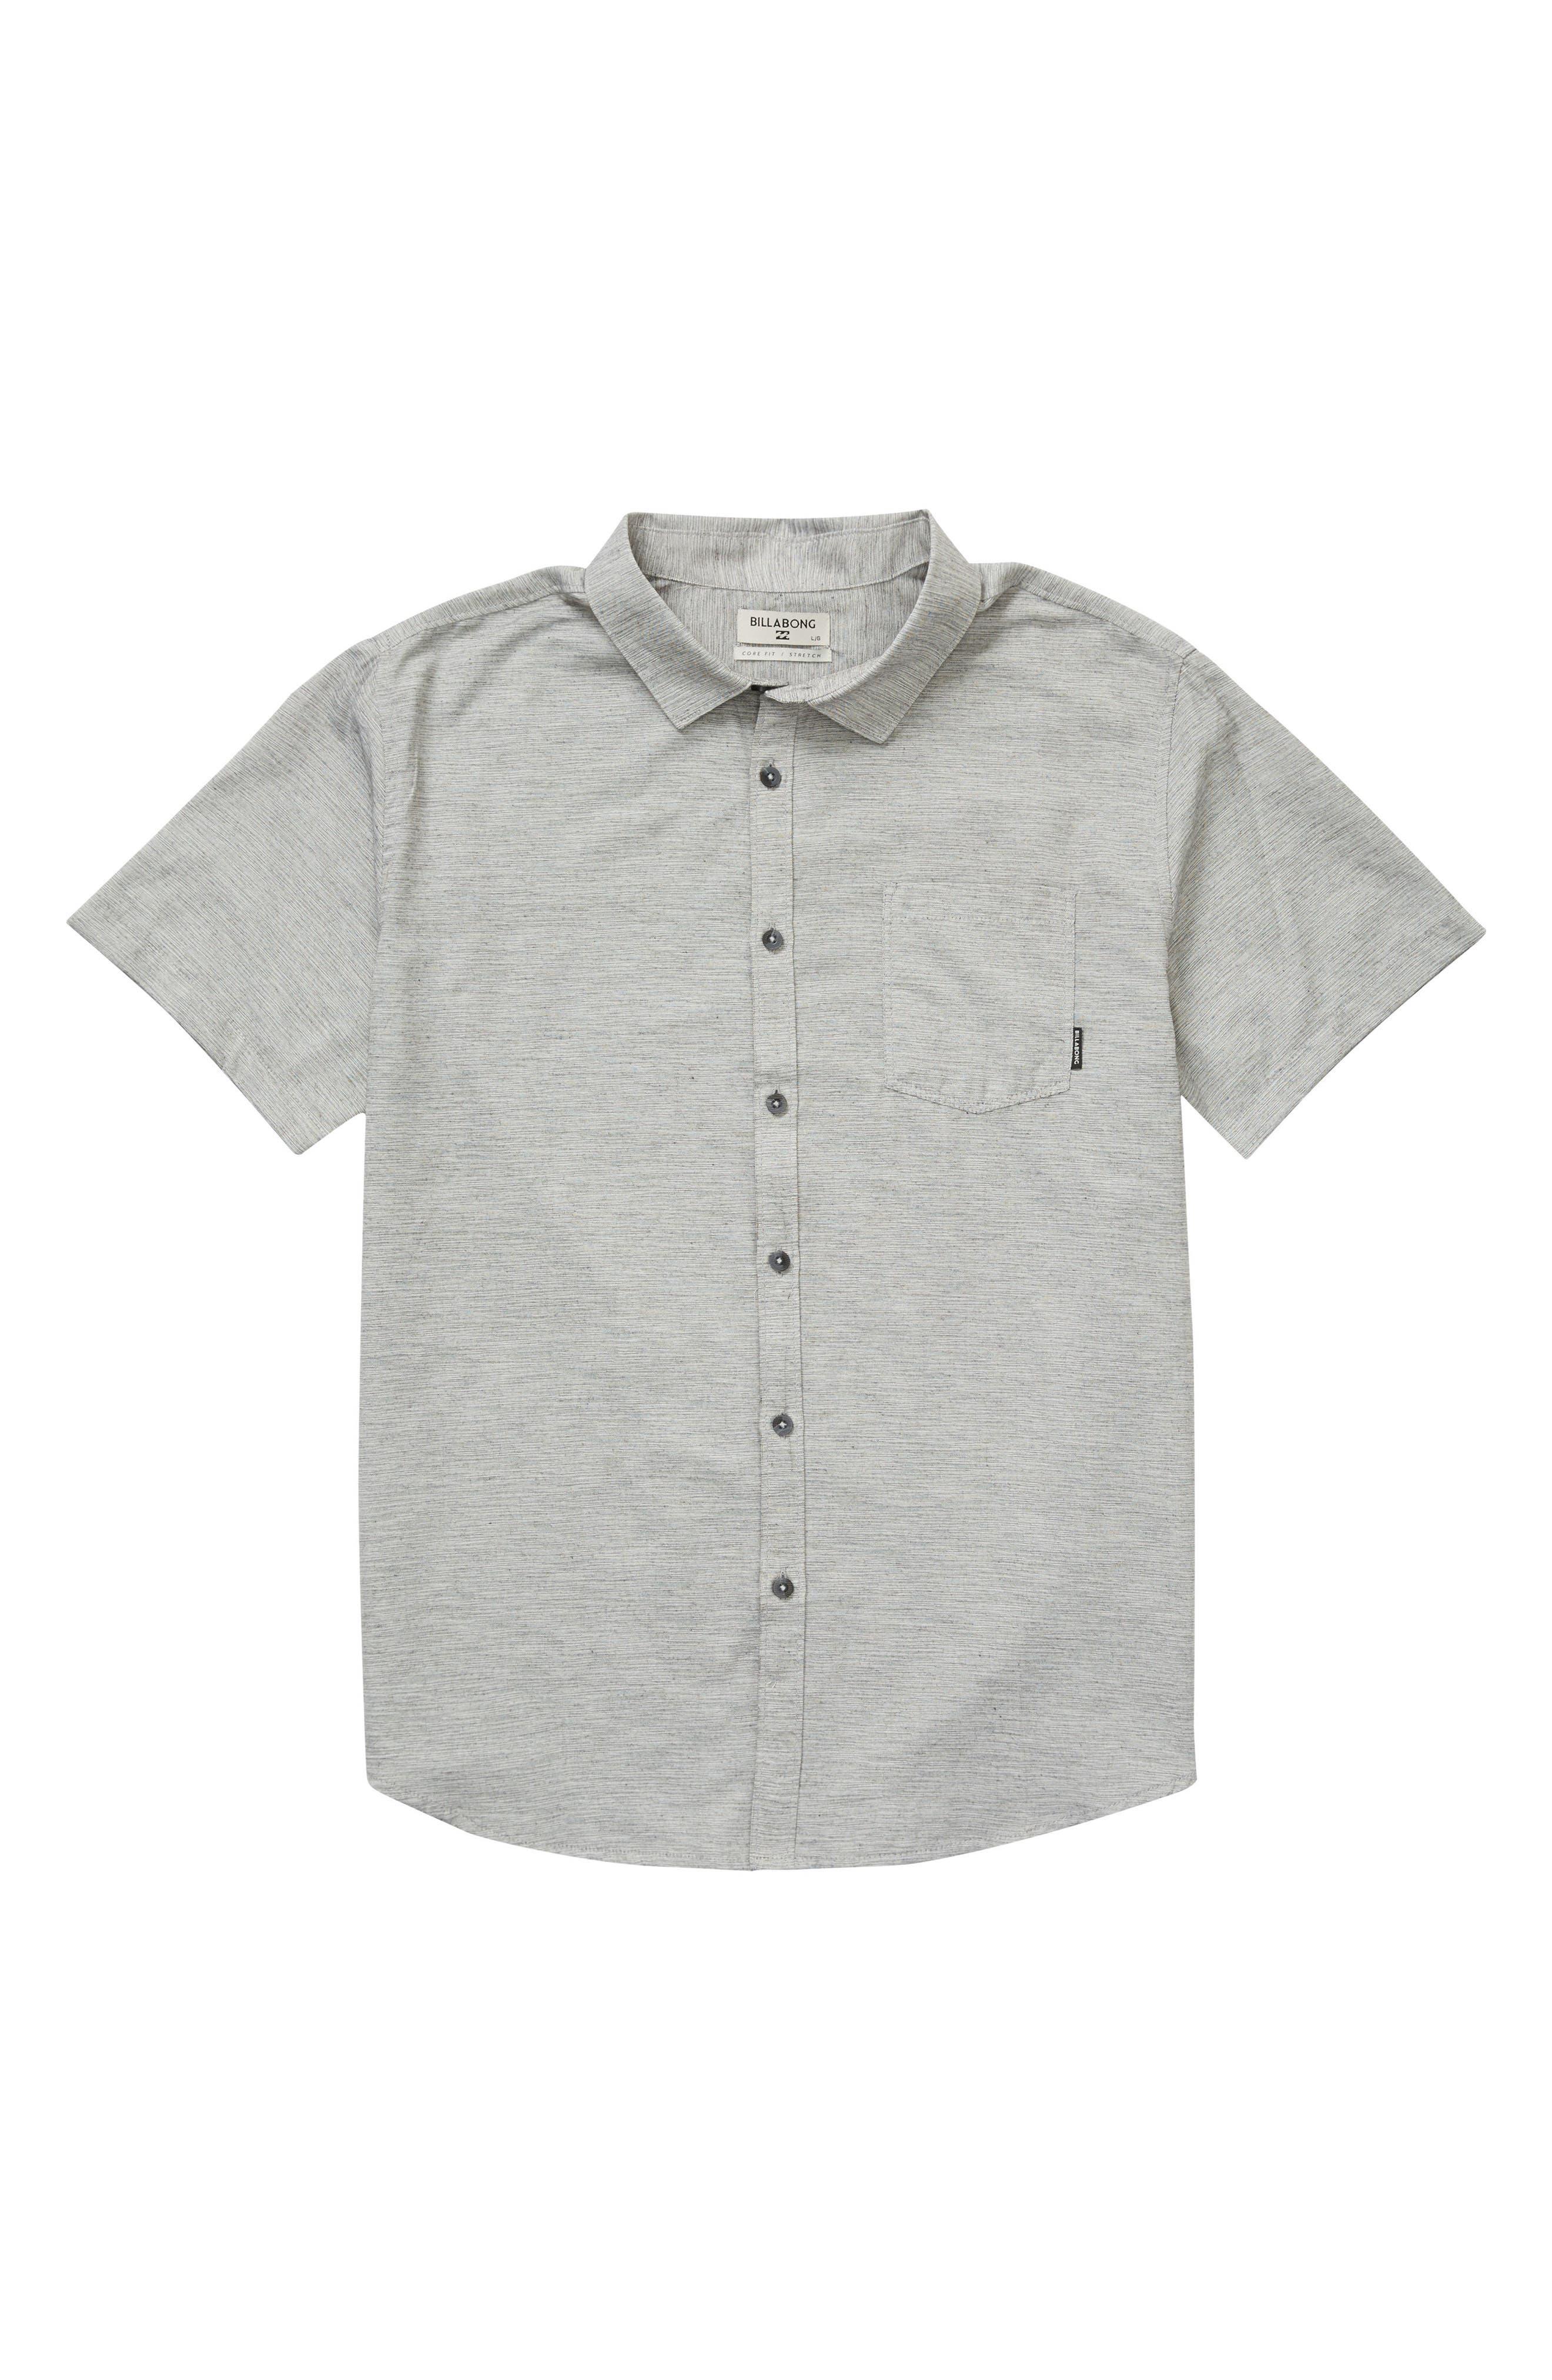 Main Image - Billabong All Day Helix Woven Shirt (Big Boys)